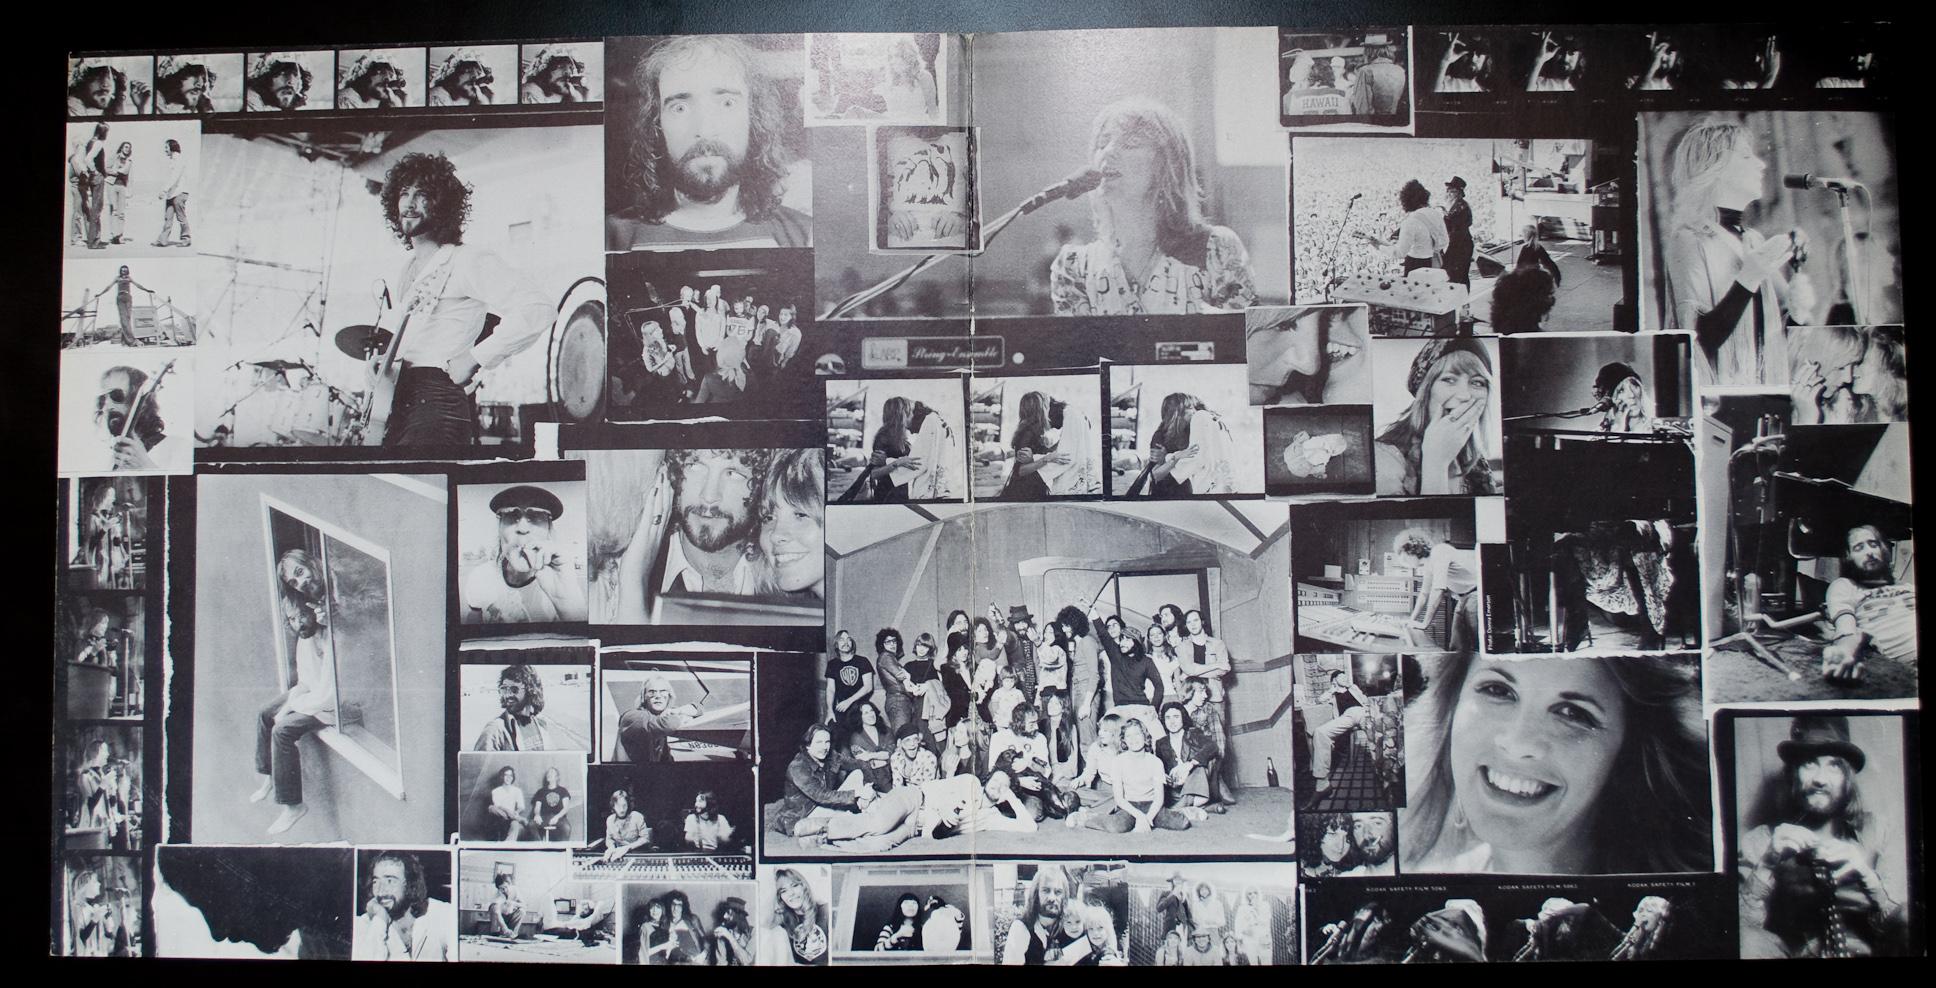 Fleetwood Mac  Rumours Vinyl Review  MoocowProductions